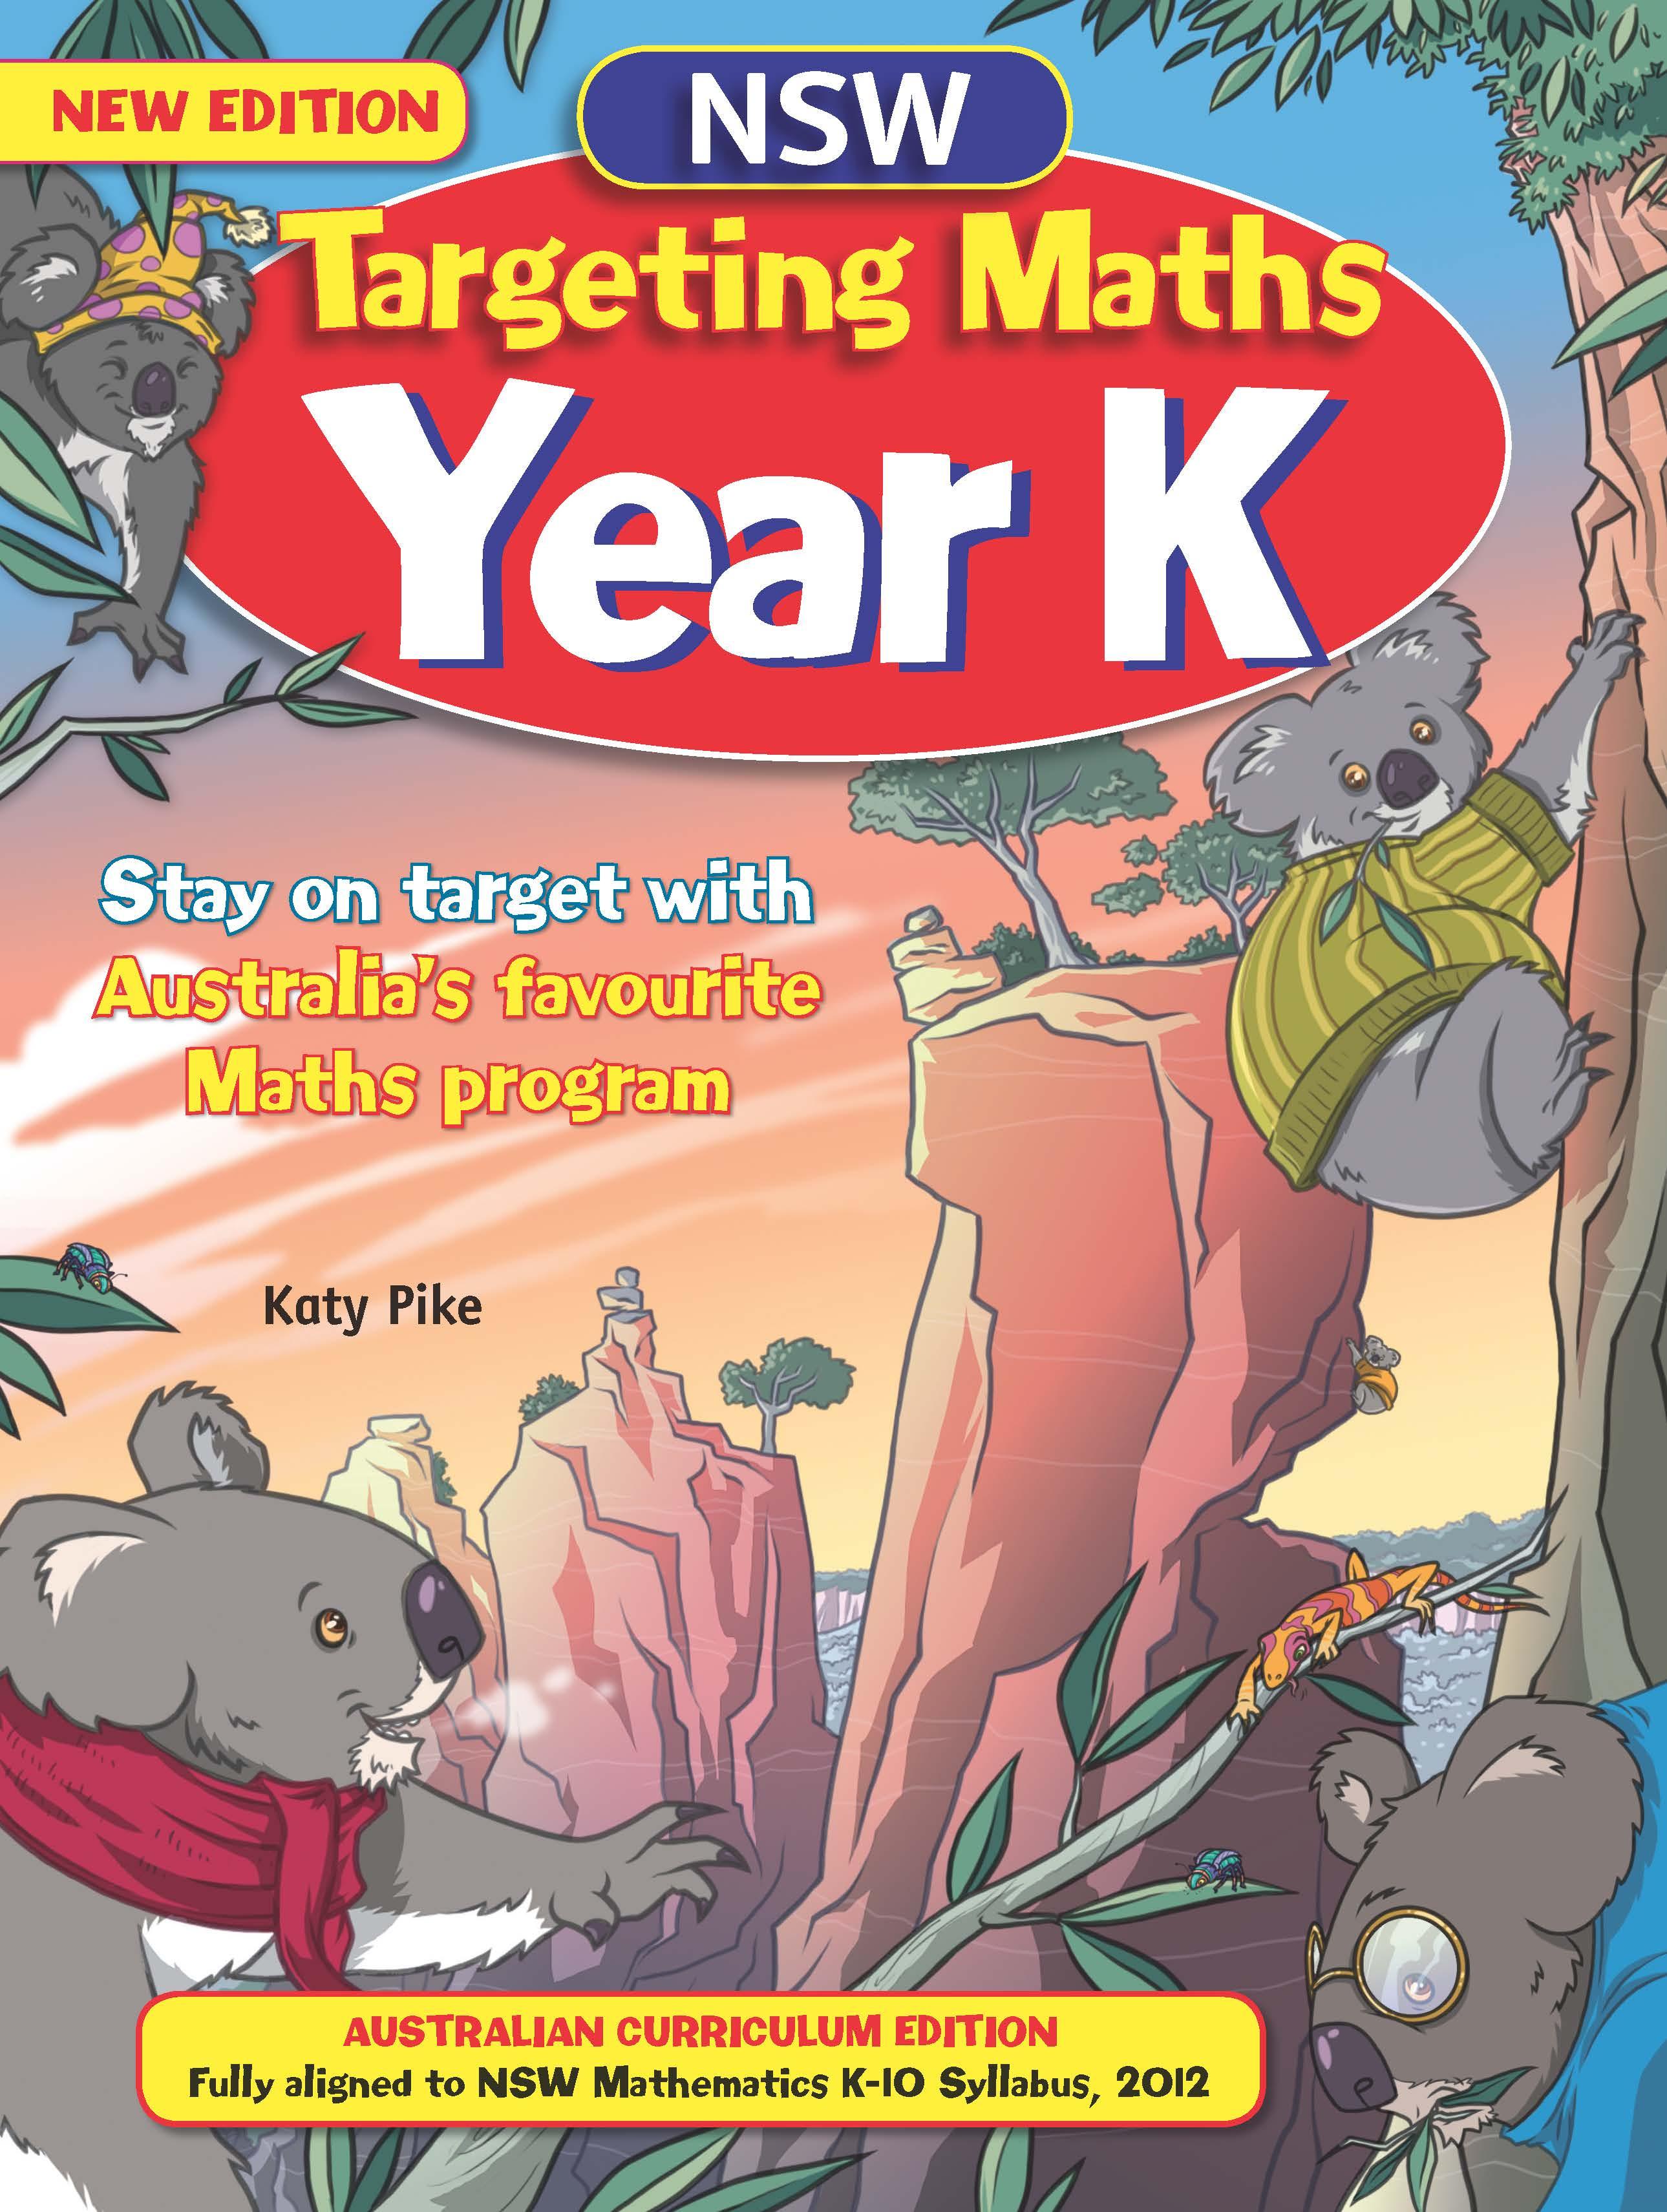 NSW Targeting Maths Australian Curriculum Edition Student Book Year K